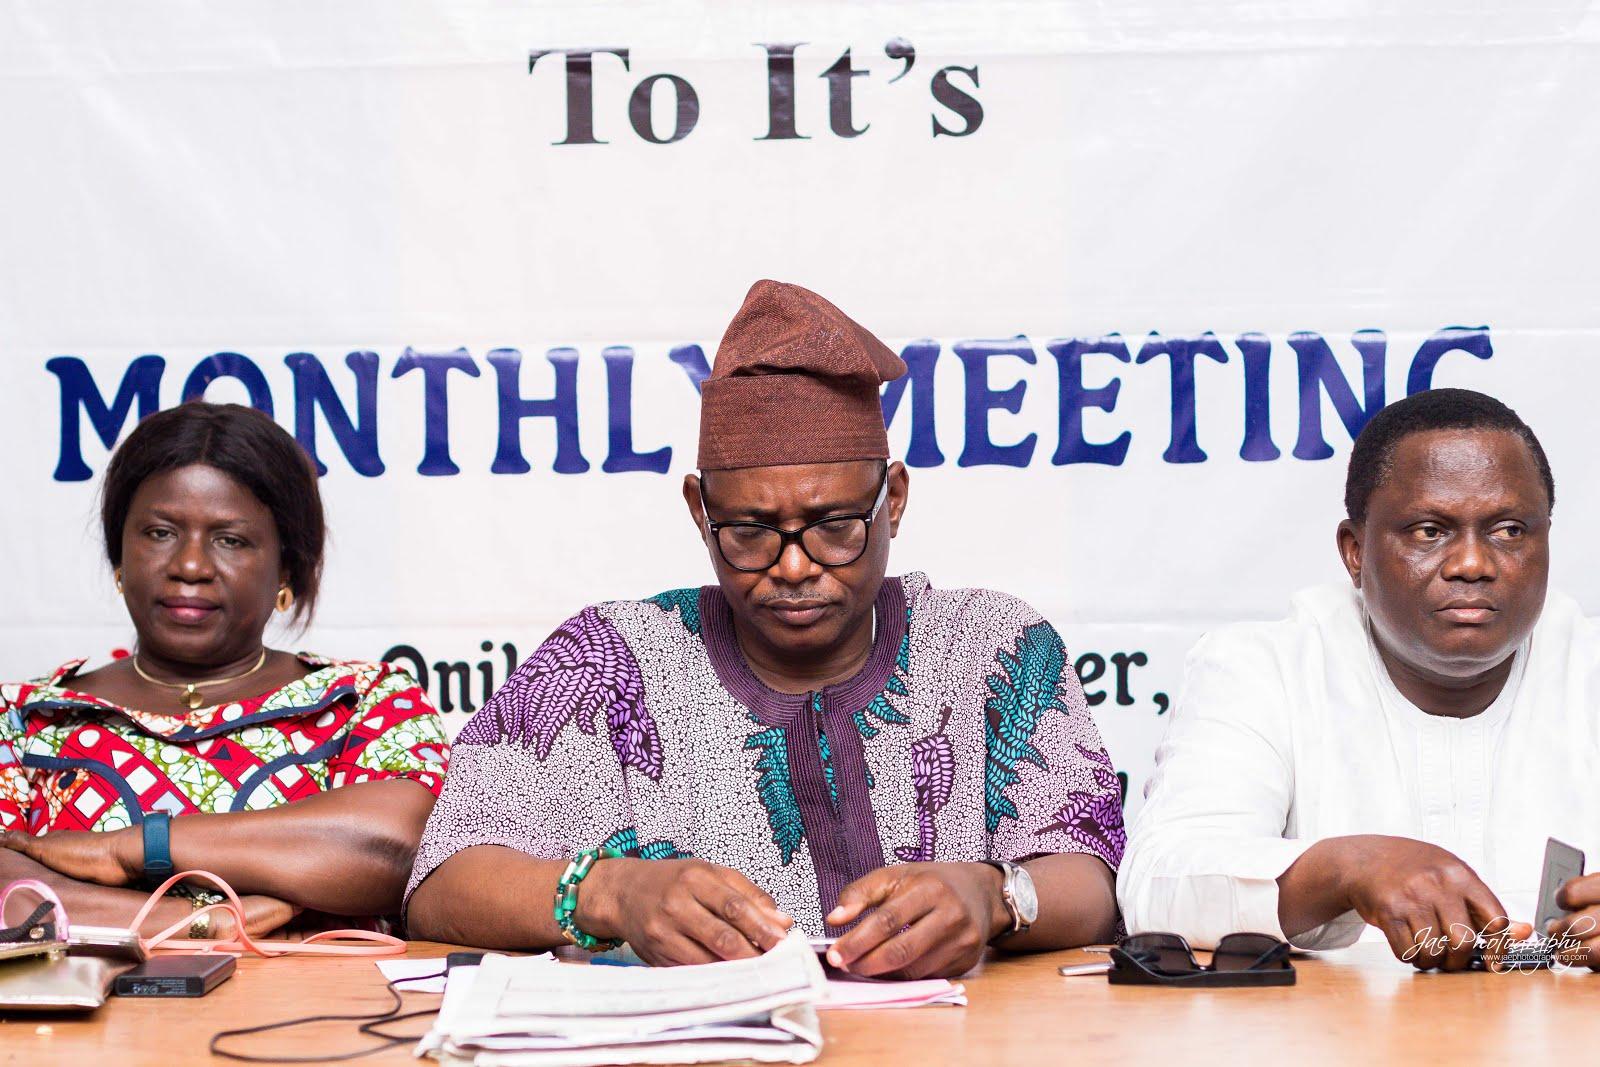 Chairman Egbe Amofin ni Eko backs Dele Adesina's Adoption